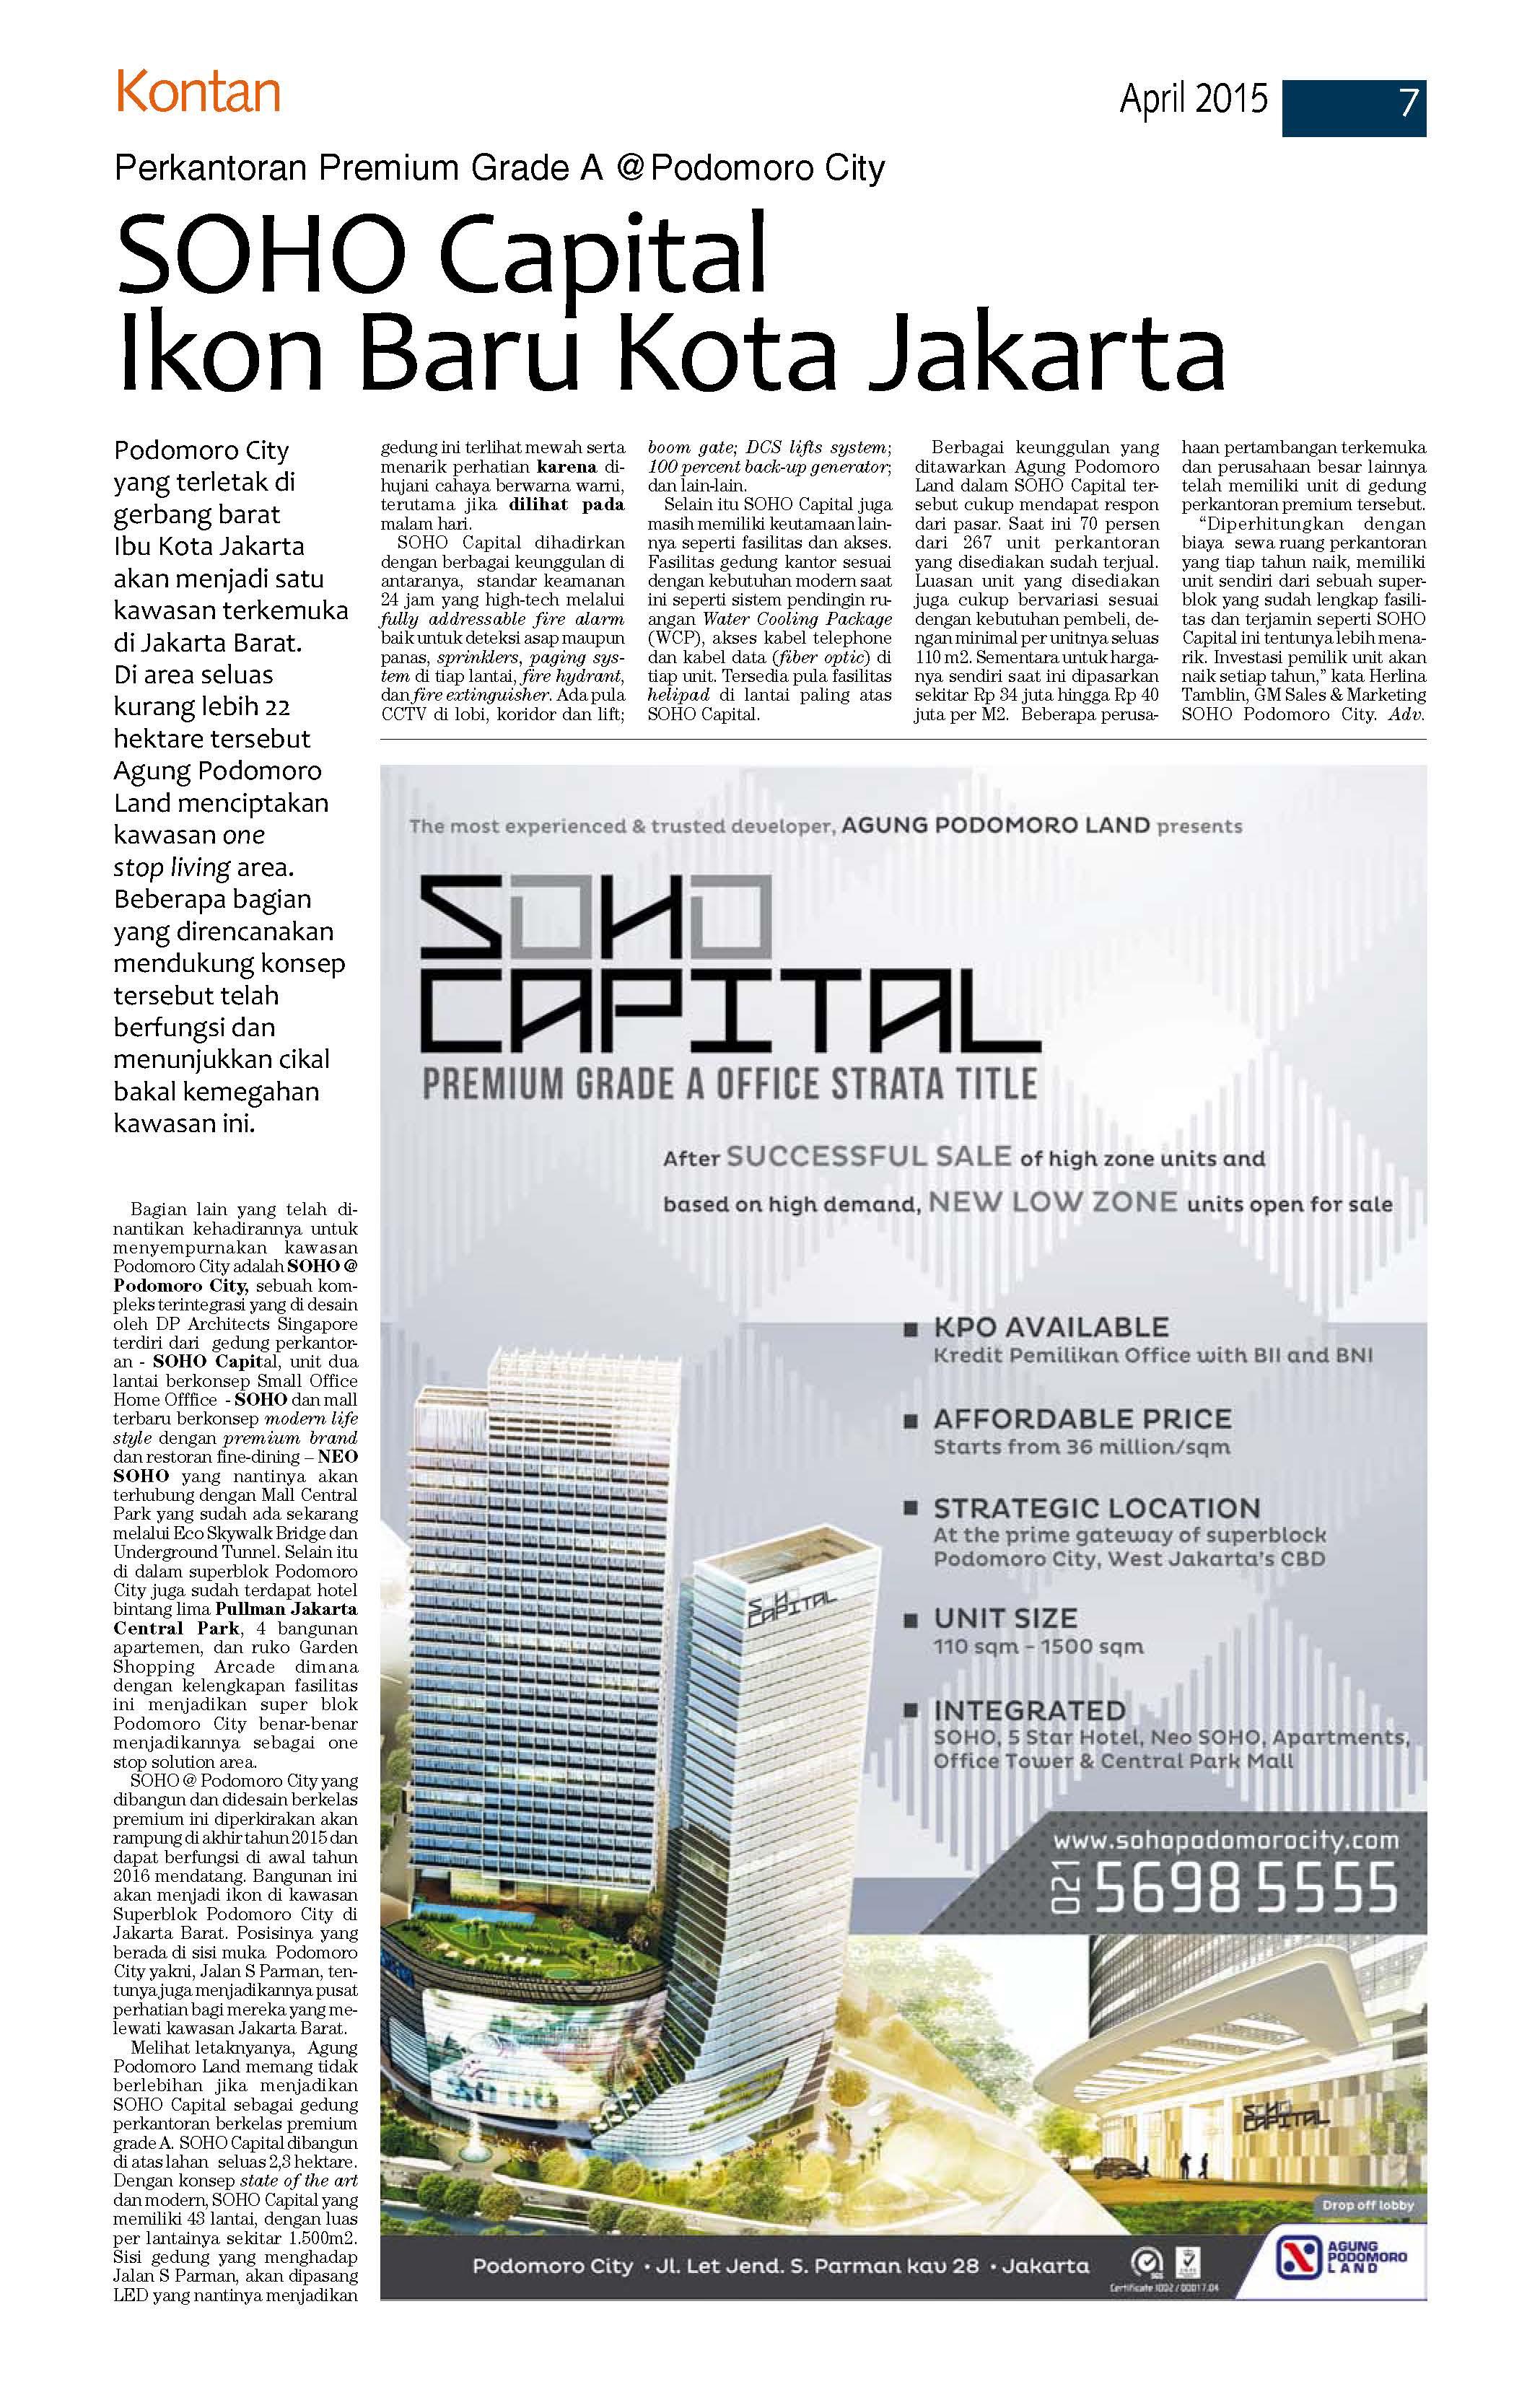 SOHO Capital-Kontan 9 April 2015